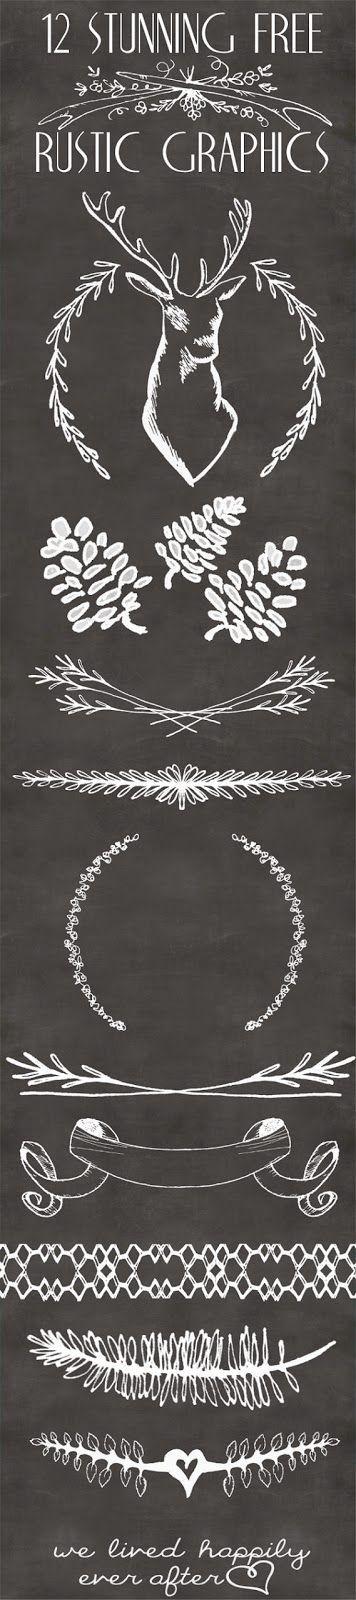 Xmas Diy & Craft: Stunning Free rustic Christmas graphics!